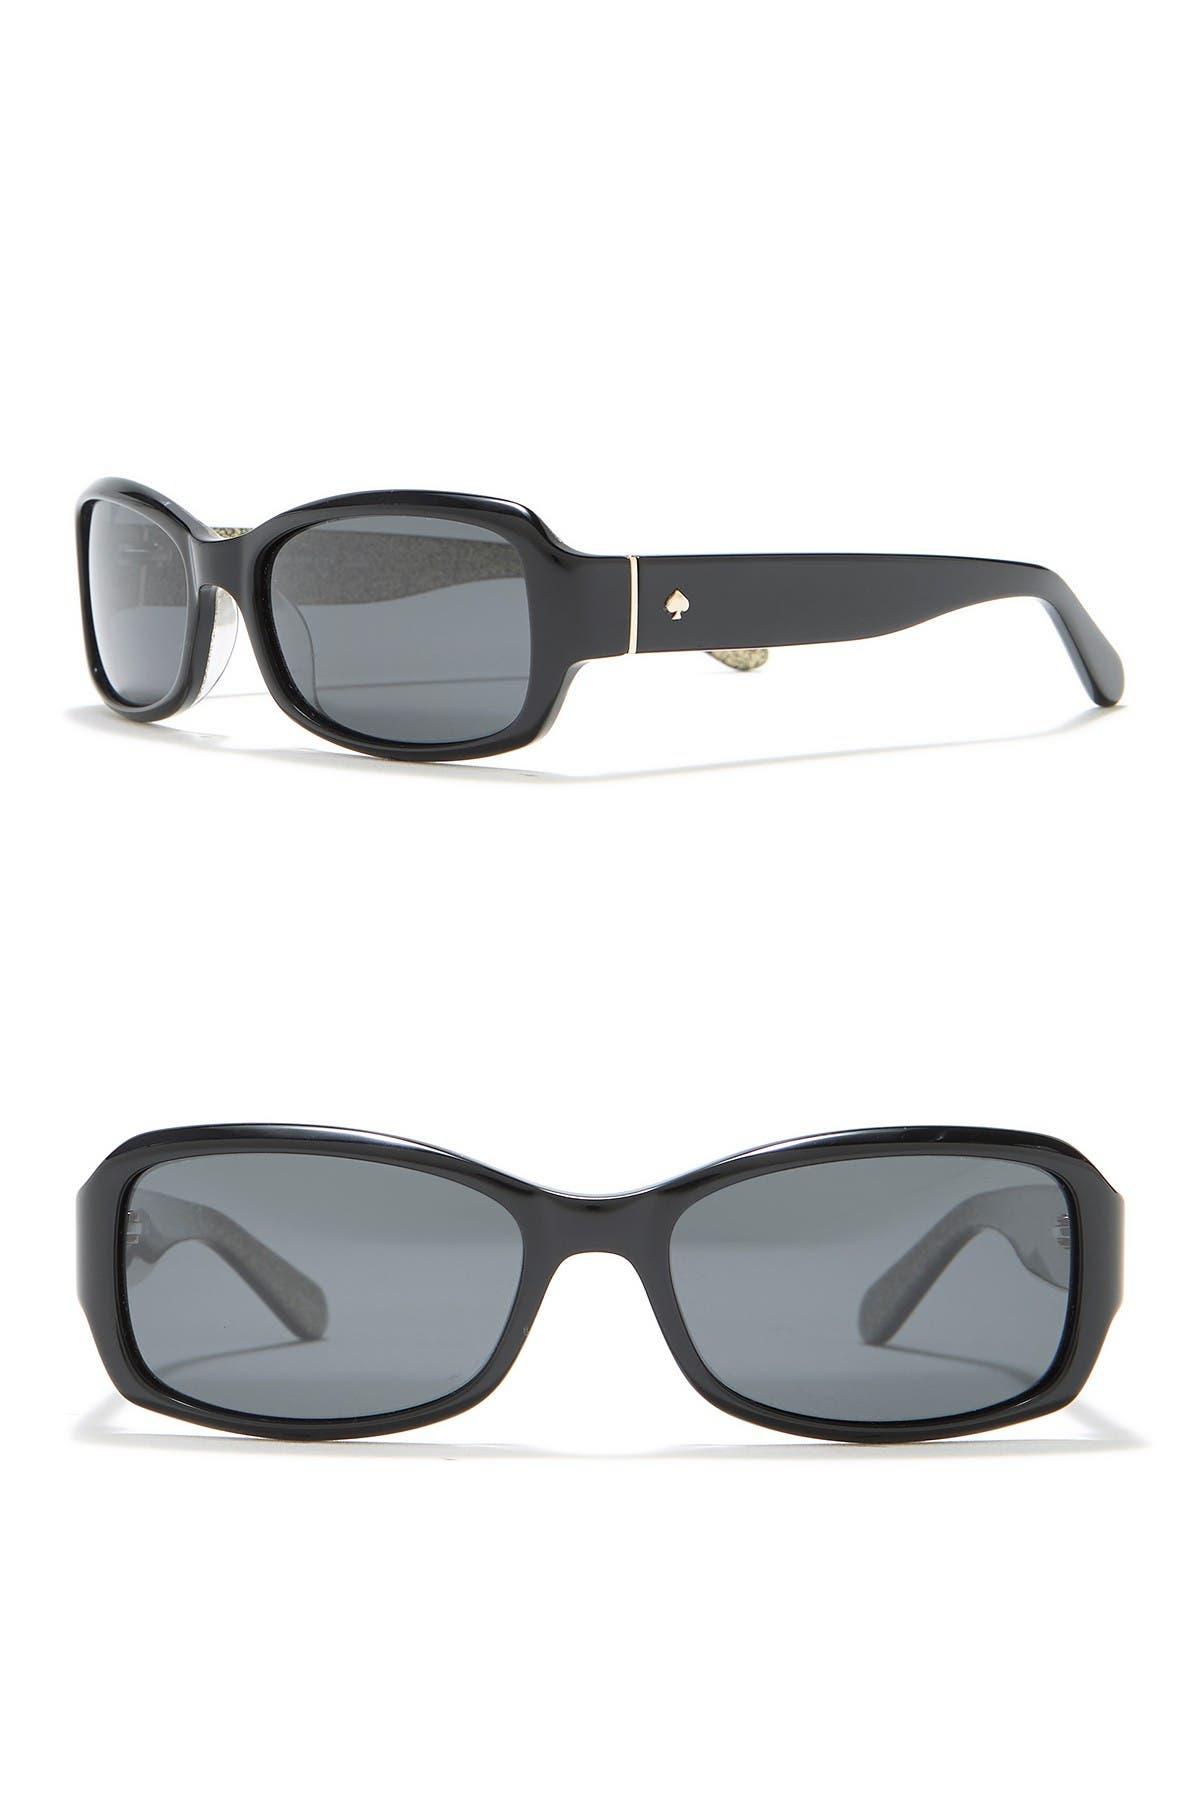 Image of kate spade new york adely 53mm rectangular polarized sunglasses